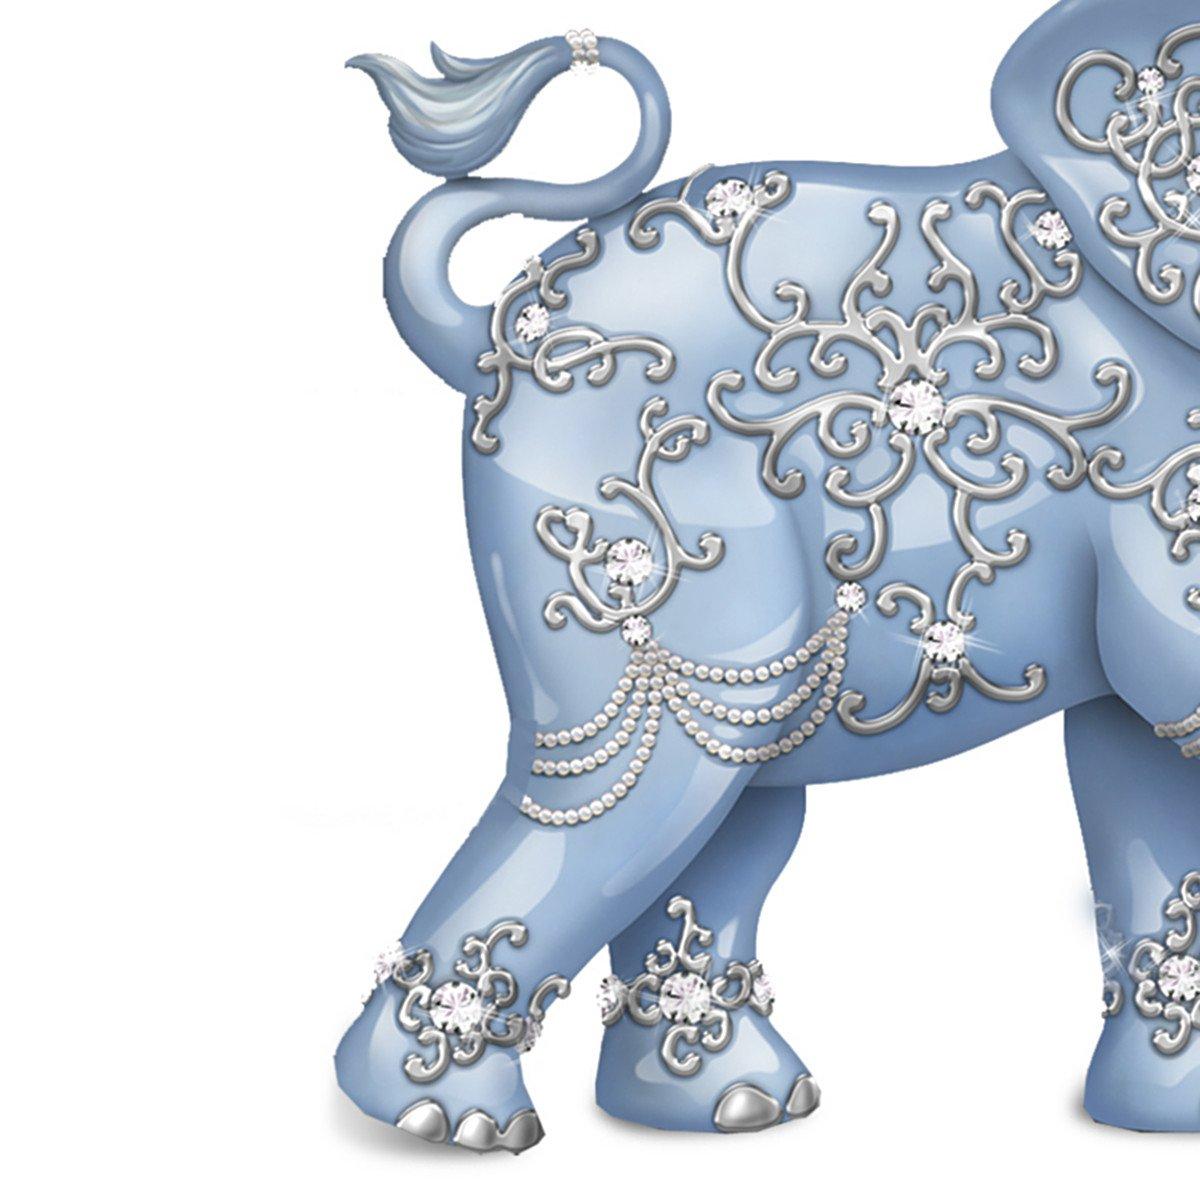 Amazon.com: Thomas Kinkade Dazzling Delight: Collectible Elephant Figurine  With Swarovski Crystal By The Hamilton Collection: Home U0026 Kitchen